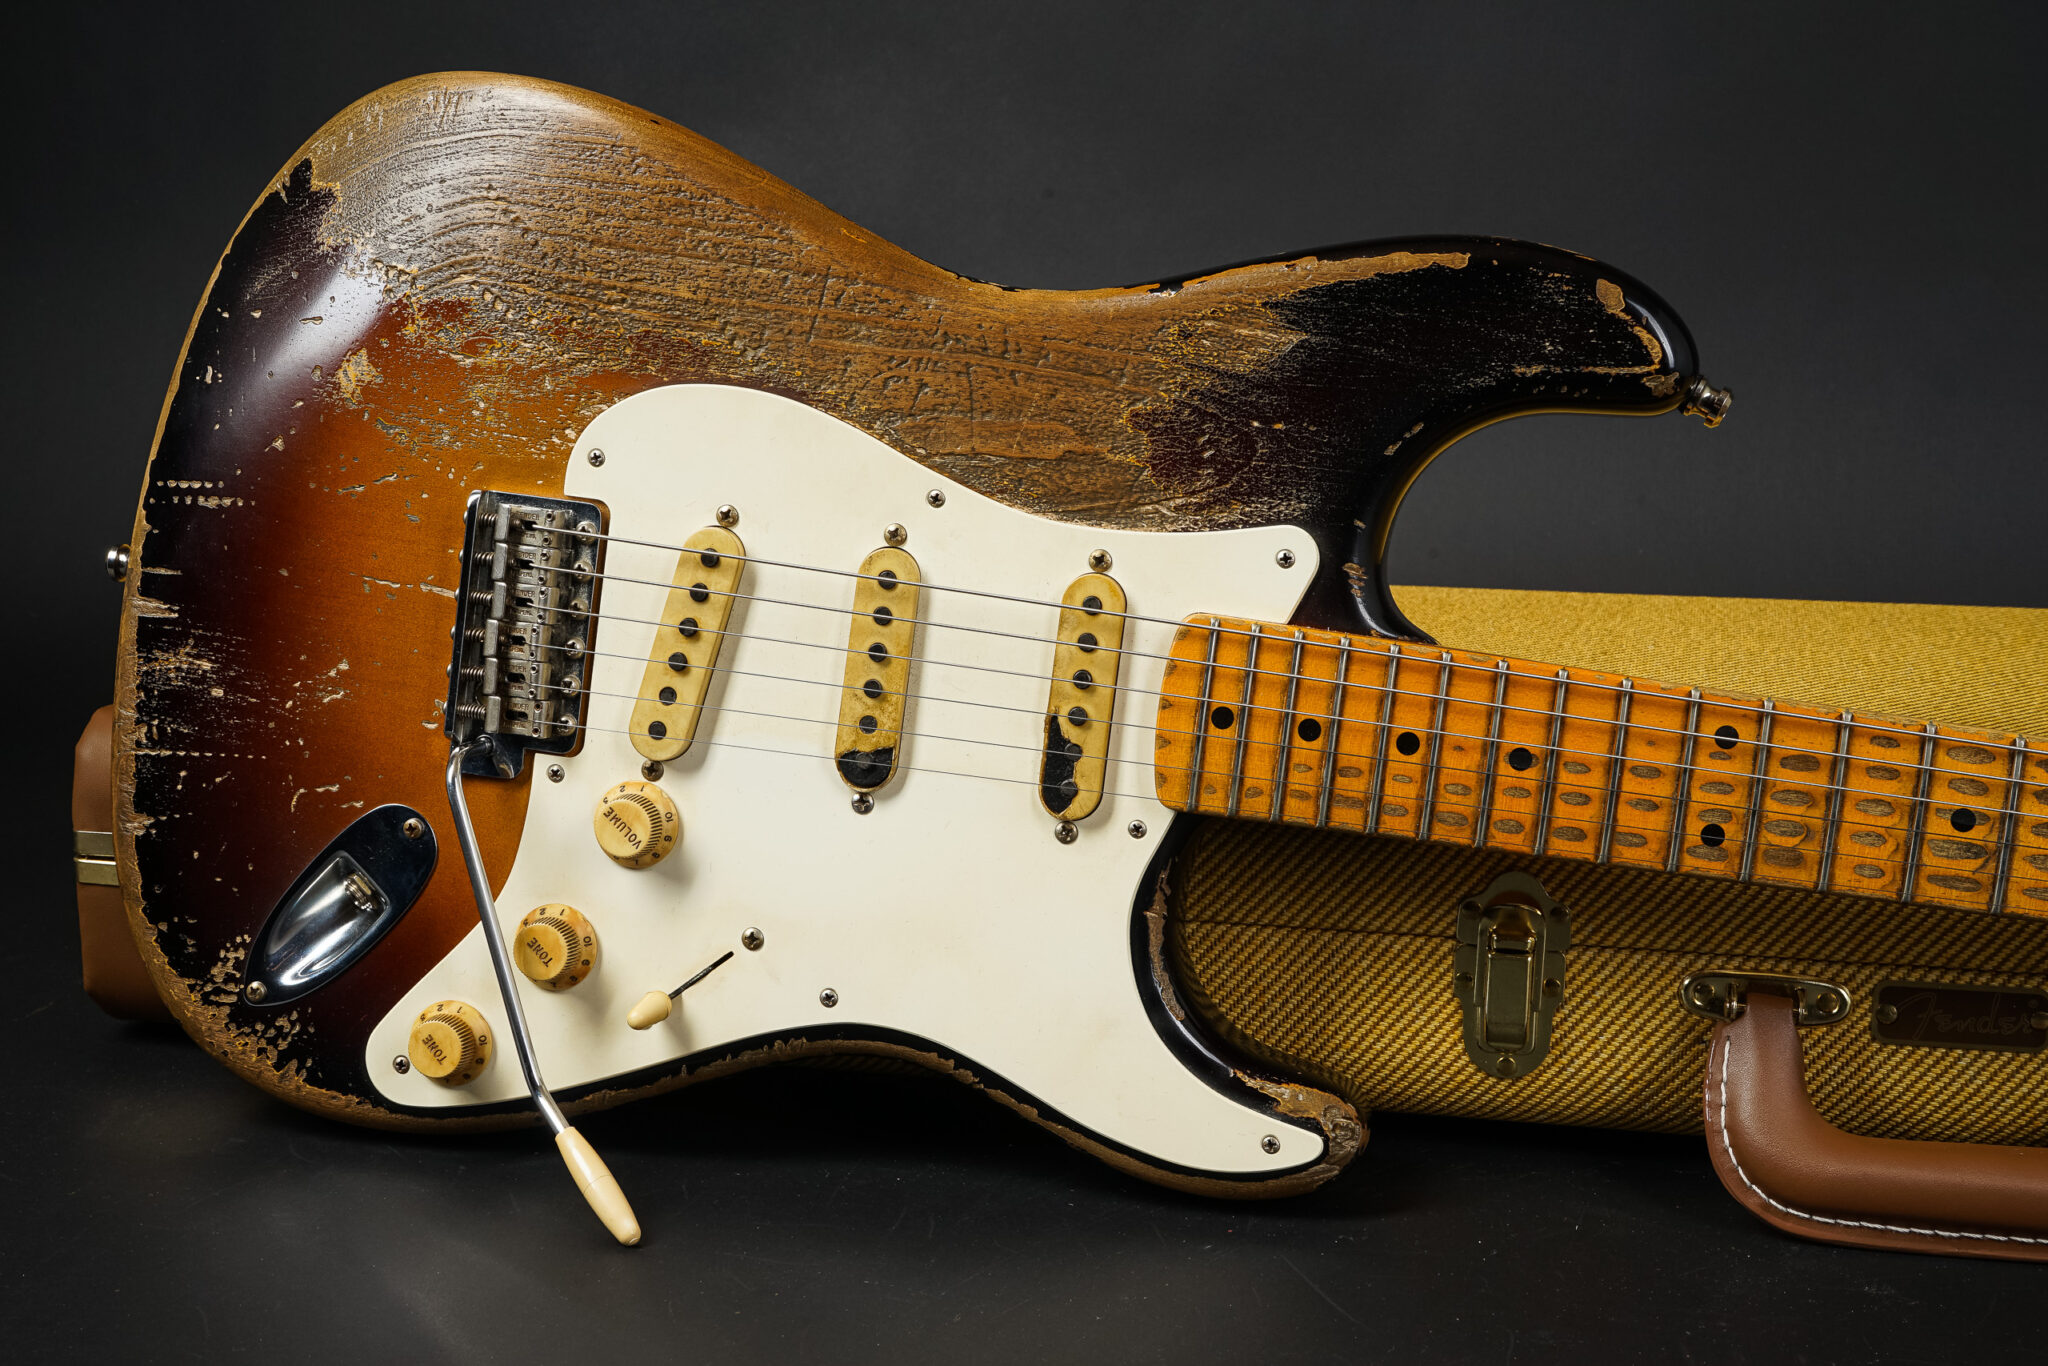 https://guitarpoint.de/app/uploads/products/2019-fender-jason-smith-masterbuilt-1957-stratocaster-heavy-relic-js0481/2019-Fender-MBKJS-57-Strat-HR-F2TS-10-2048x1366.jpg